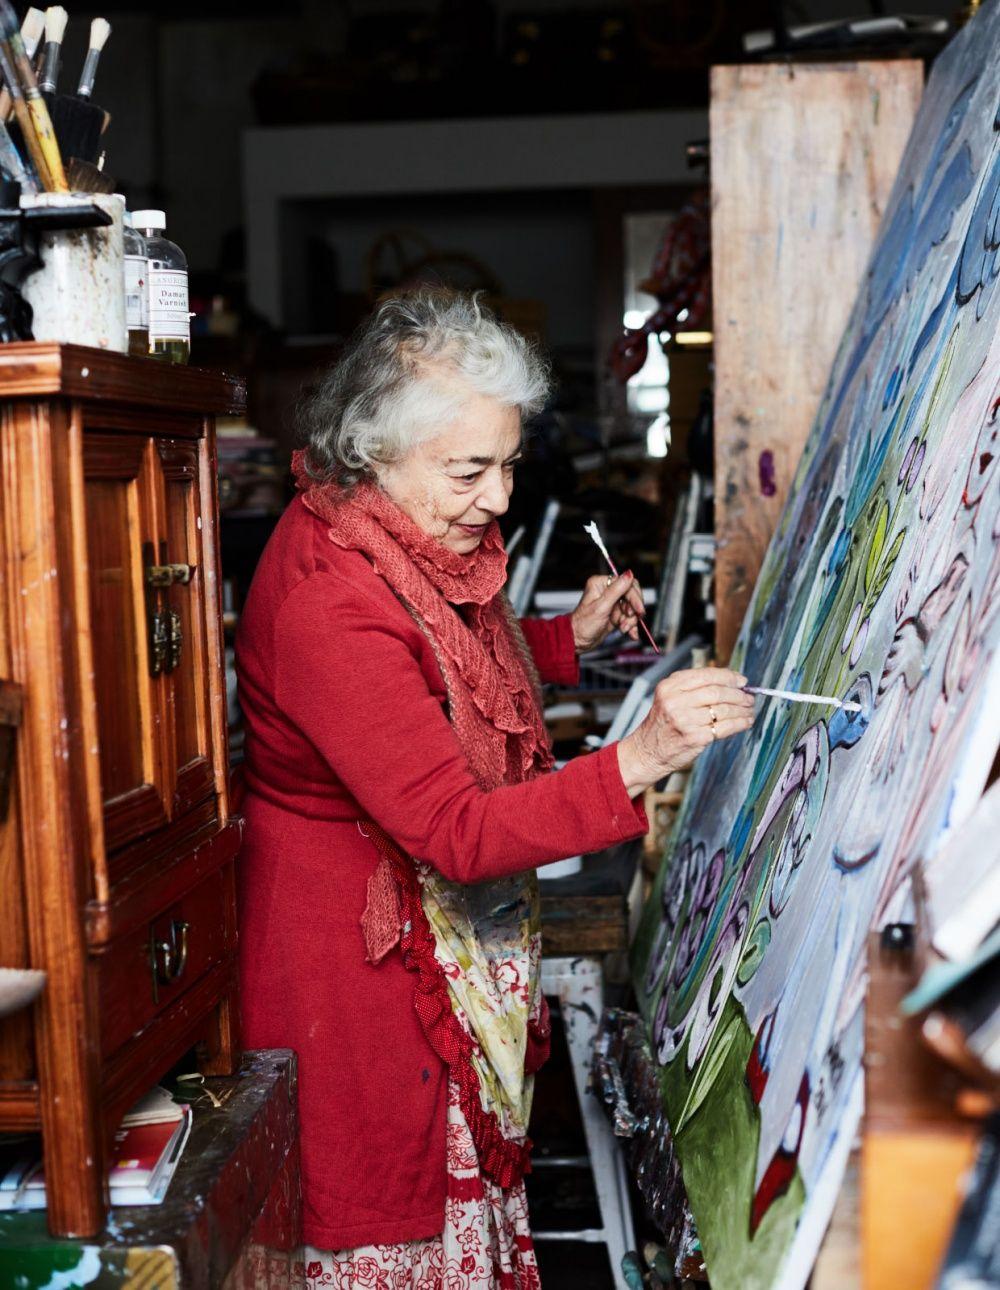 The Inimitable Mirka Mora in her studio painting - The Design Files | Australia's most popular design blog #MirkaMora #makers #workspace #paintings #artist